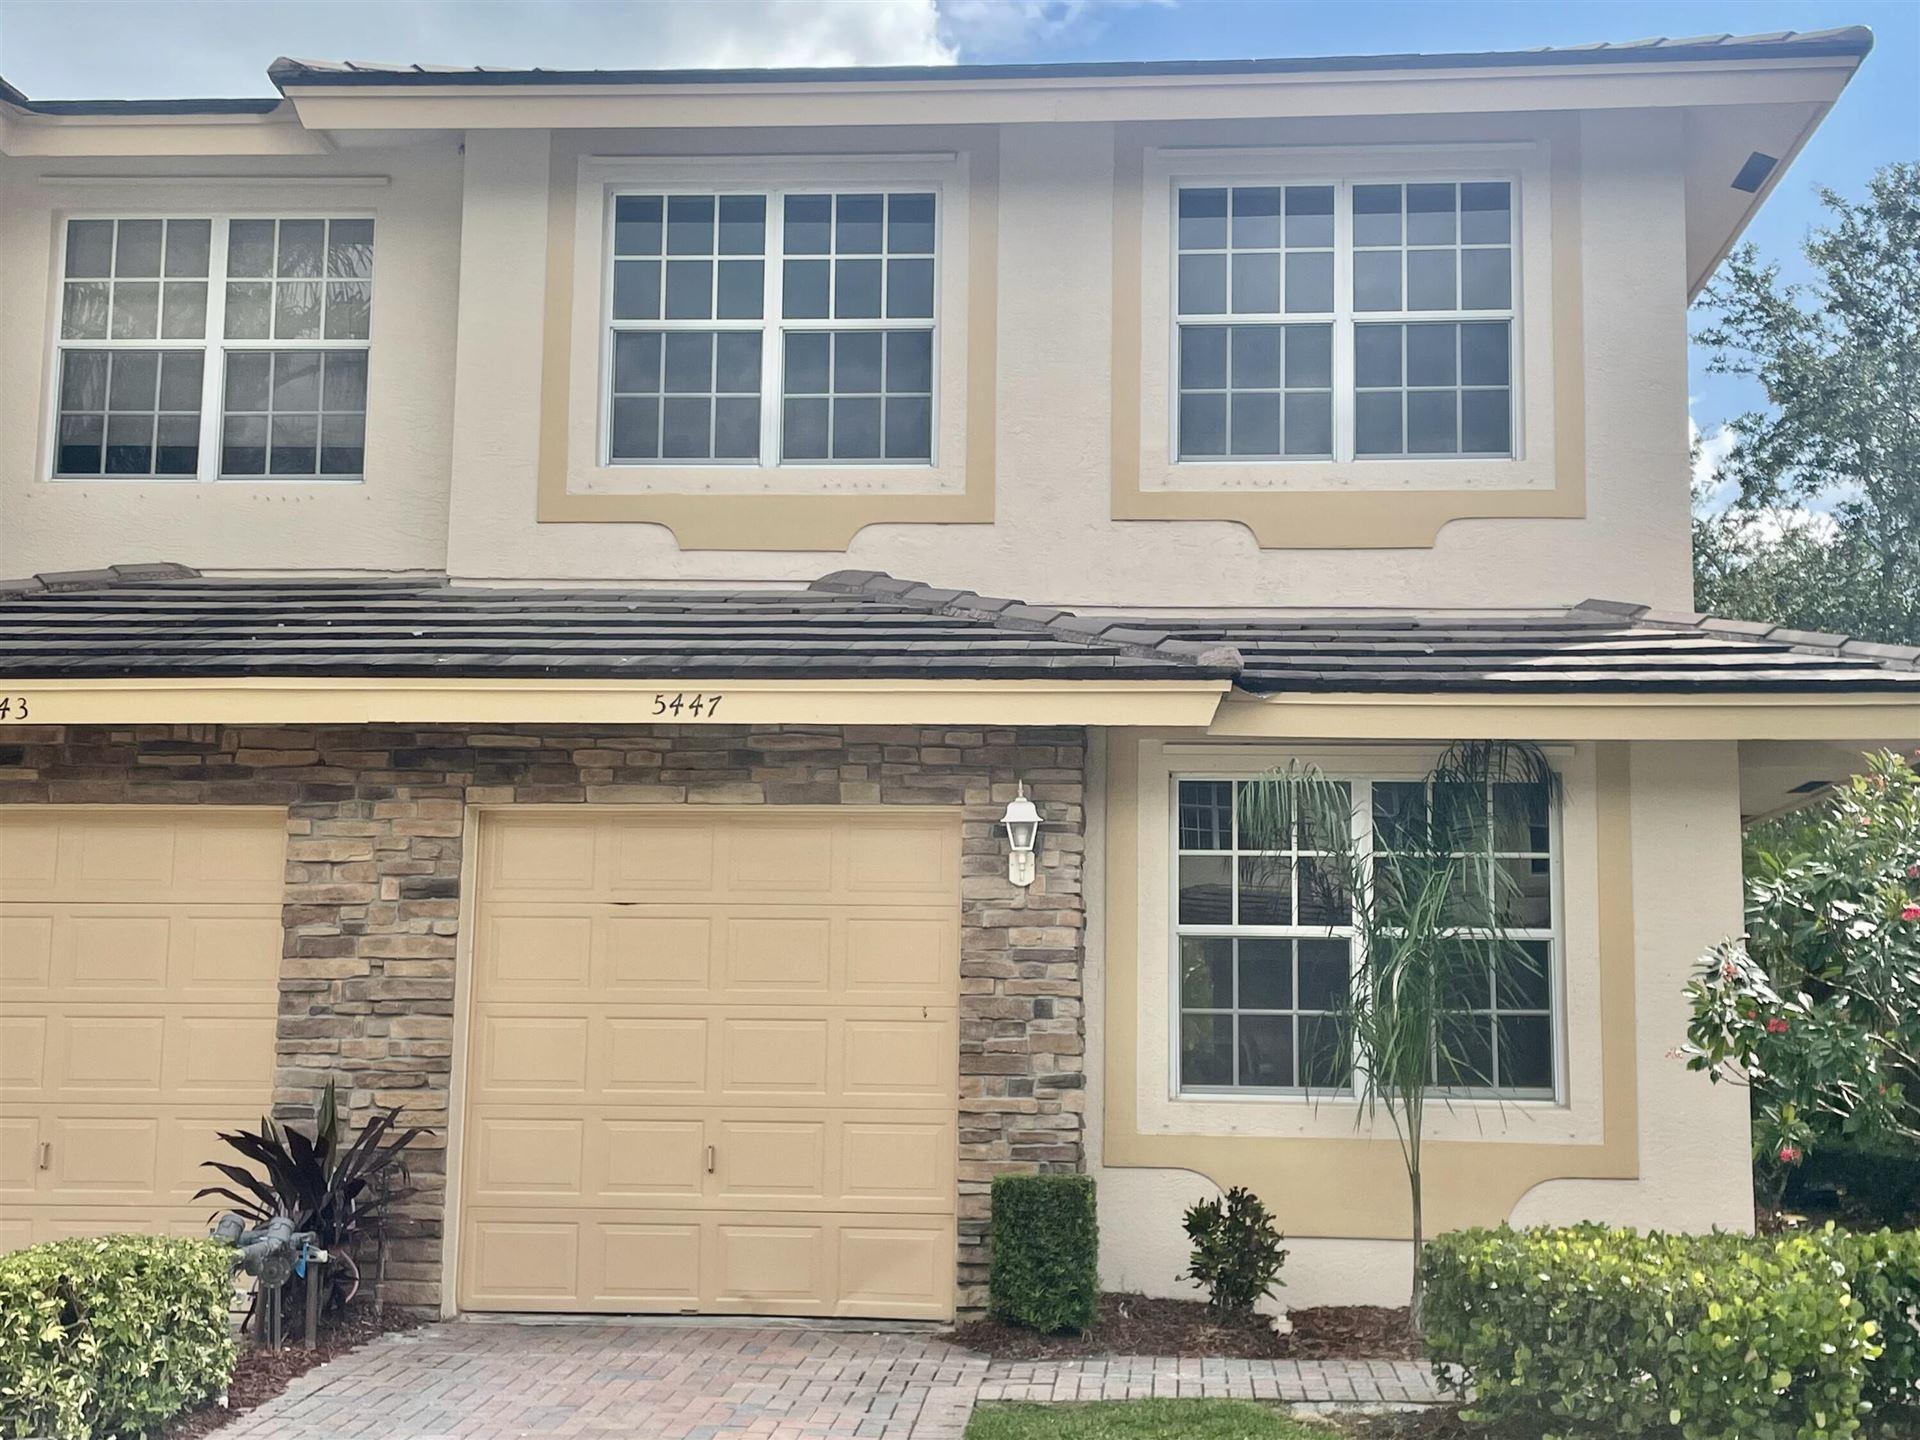 5447 SE Moseley Drive, Stuart, FL 34997 - #: RX-10746197